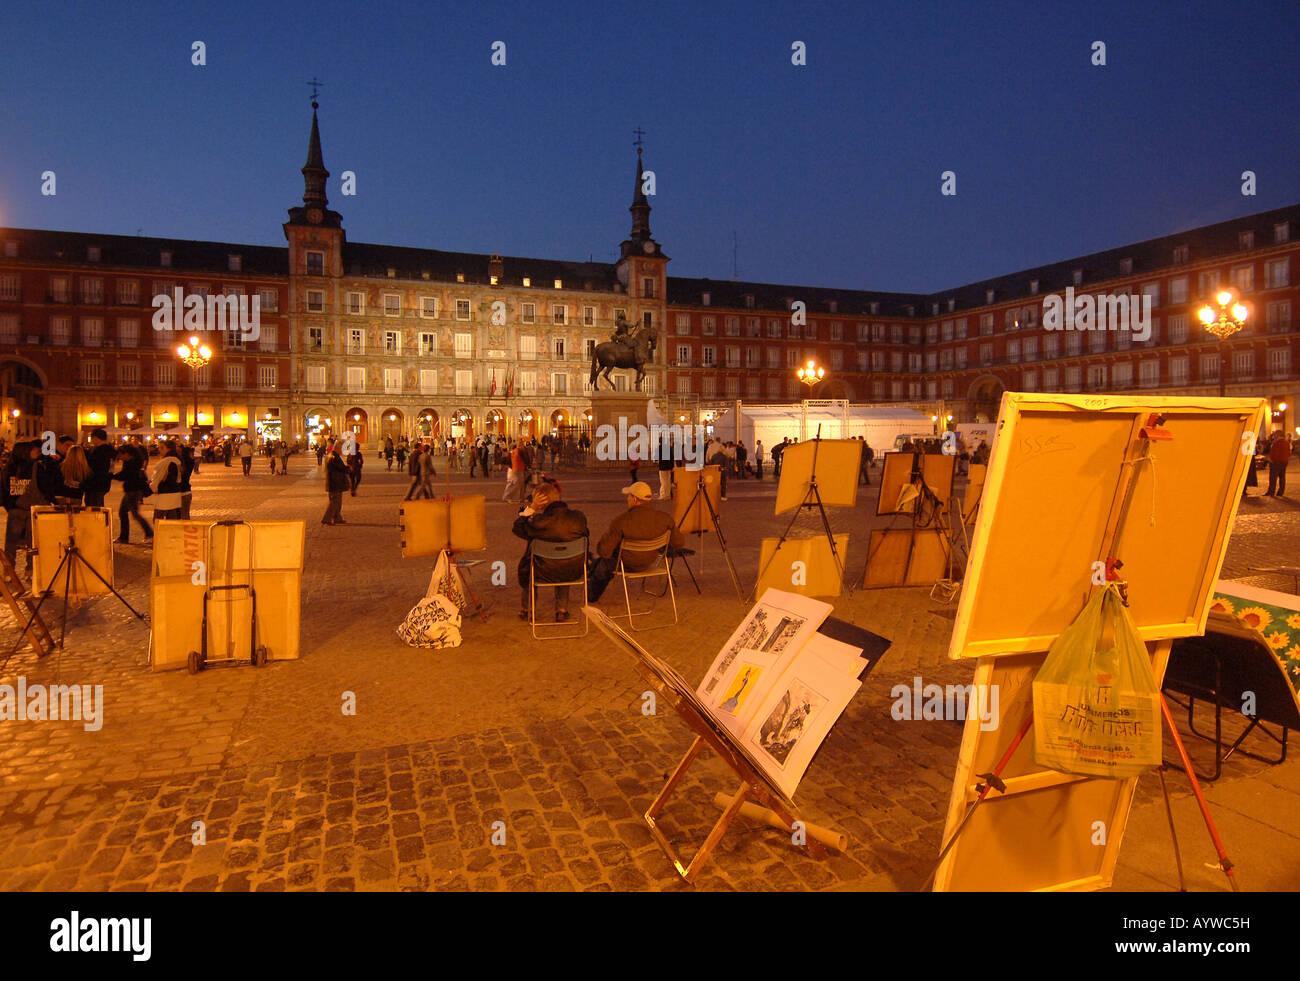 Spain Madrid capital Plaza Major Puerta del Sol night - Stock Image